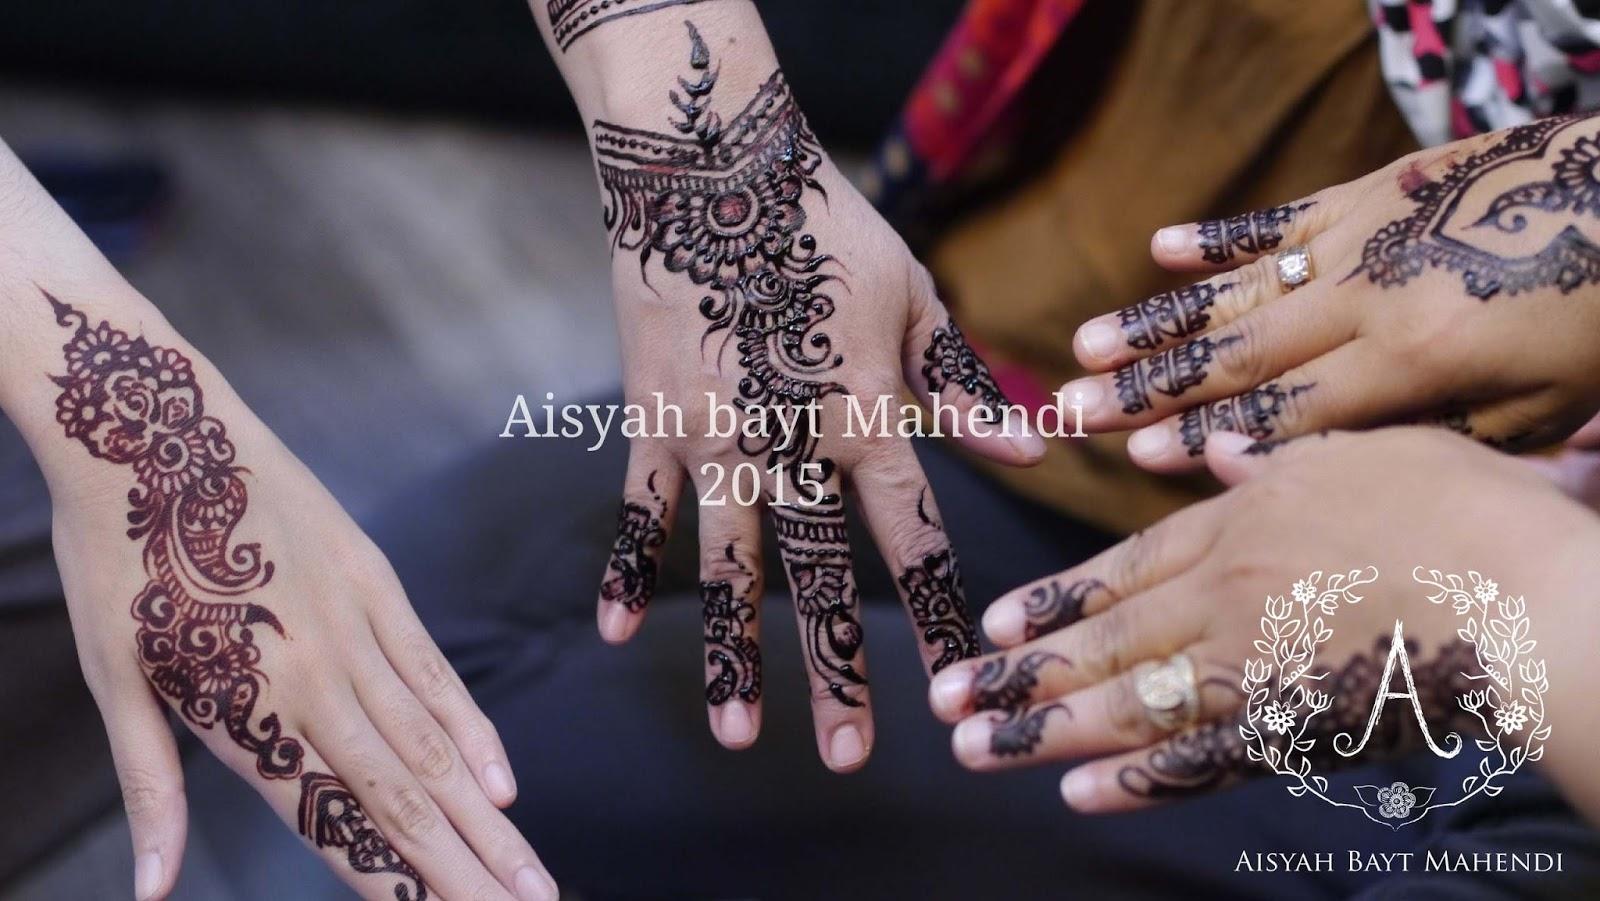 Aisyah Bayt Mahendi Henna Picture